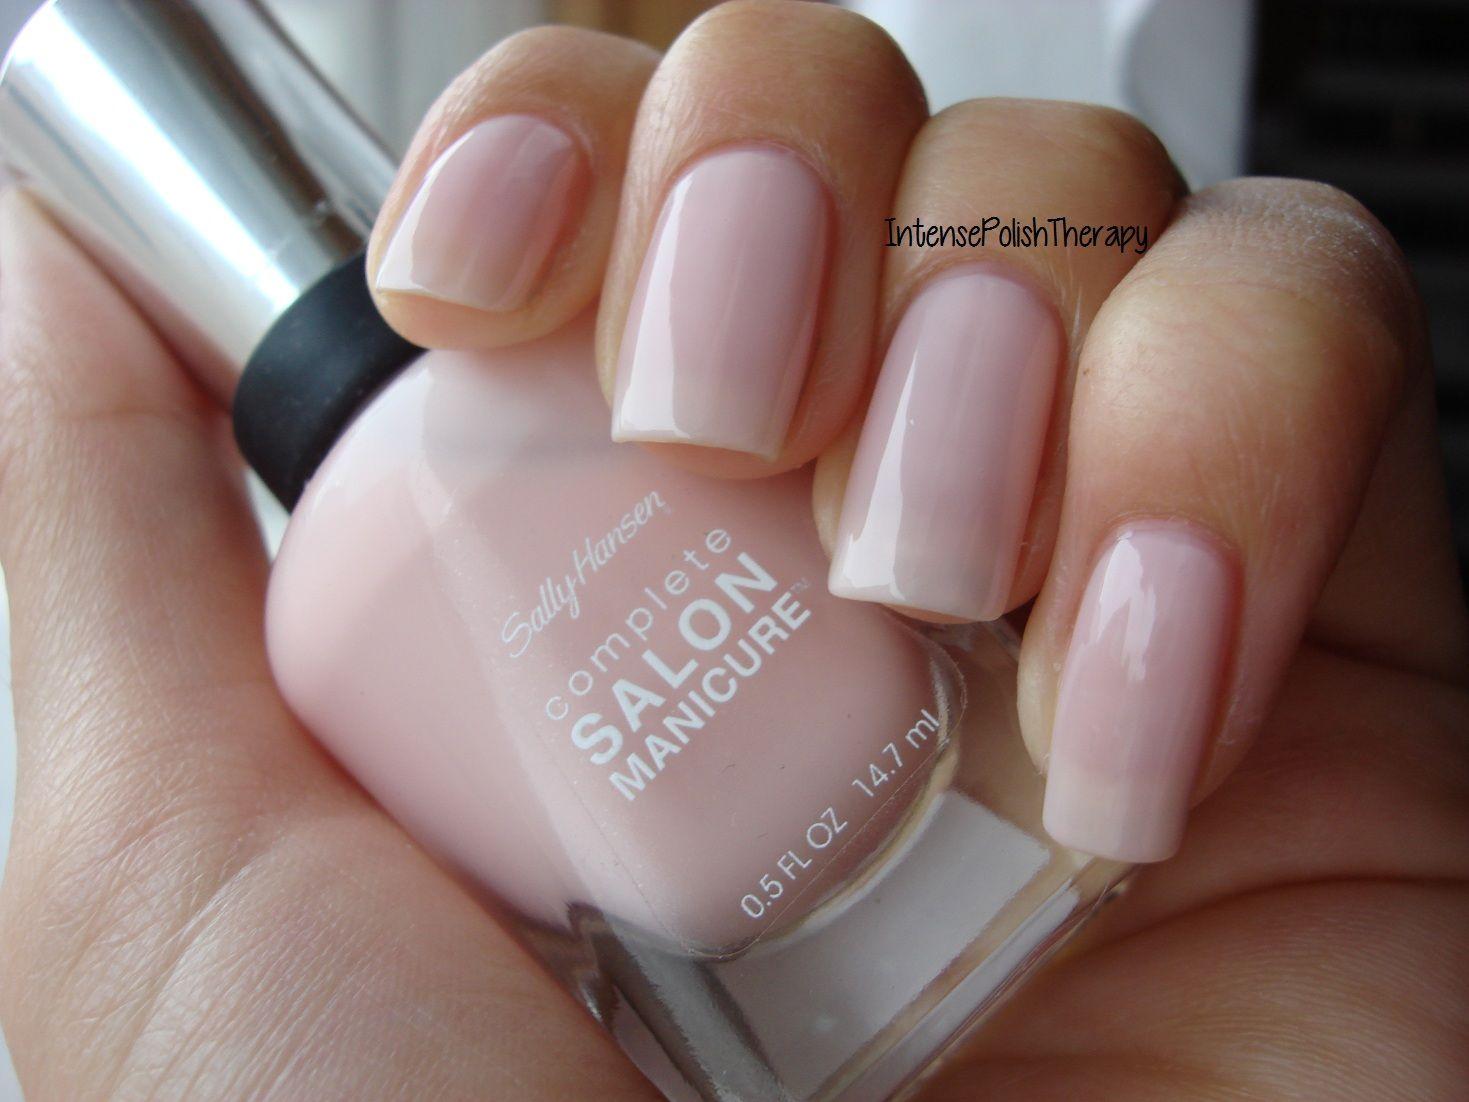 Sally Hansen Complete Salon Manicure Sweet Talker 340 Reviews Photos Ingredients Makeupalley